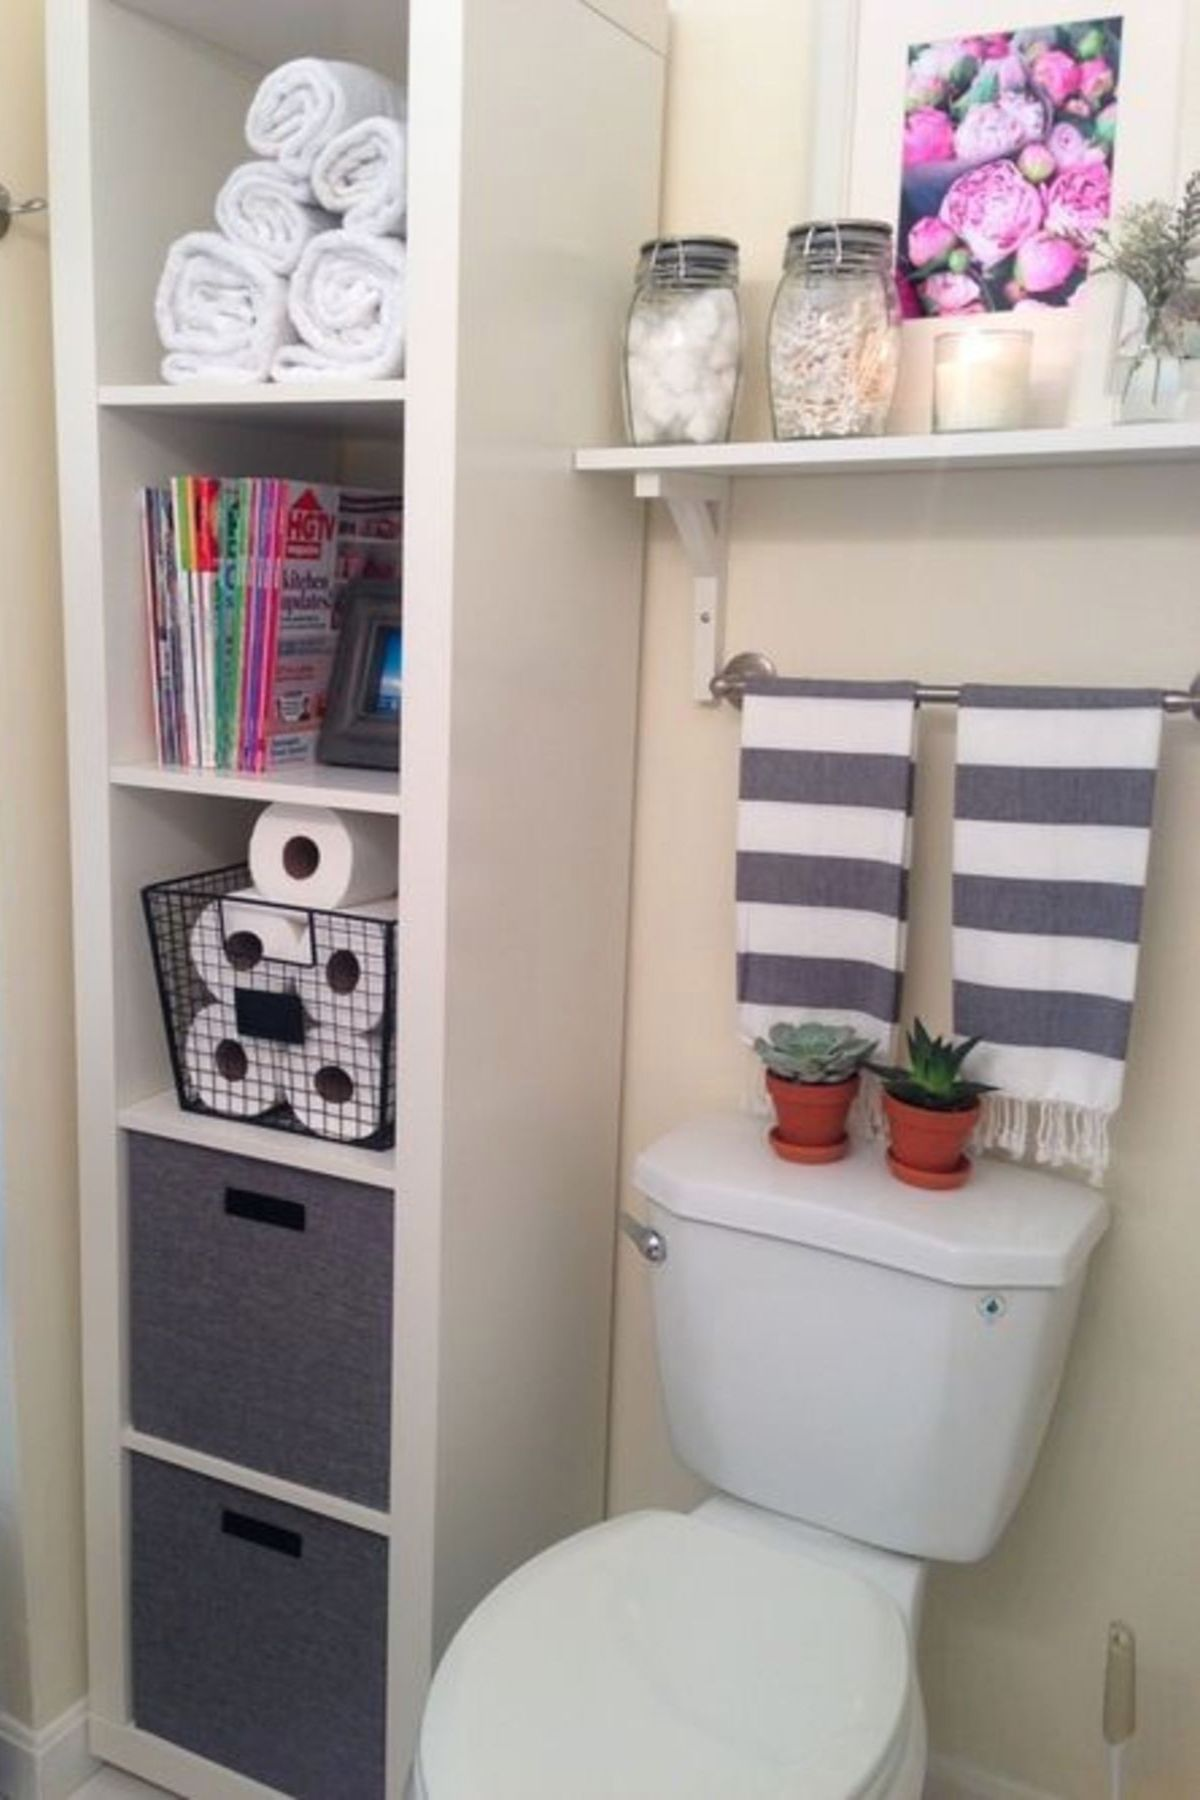 Creative Bathroom Storage Solutions For Small Bathrooms And Organization Ideas We Love Diy Bathroom Storage Bathroom Storage Solutions Bathroom Storage Hacks